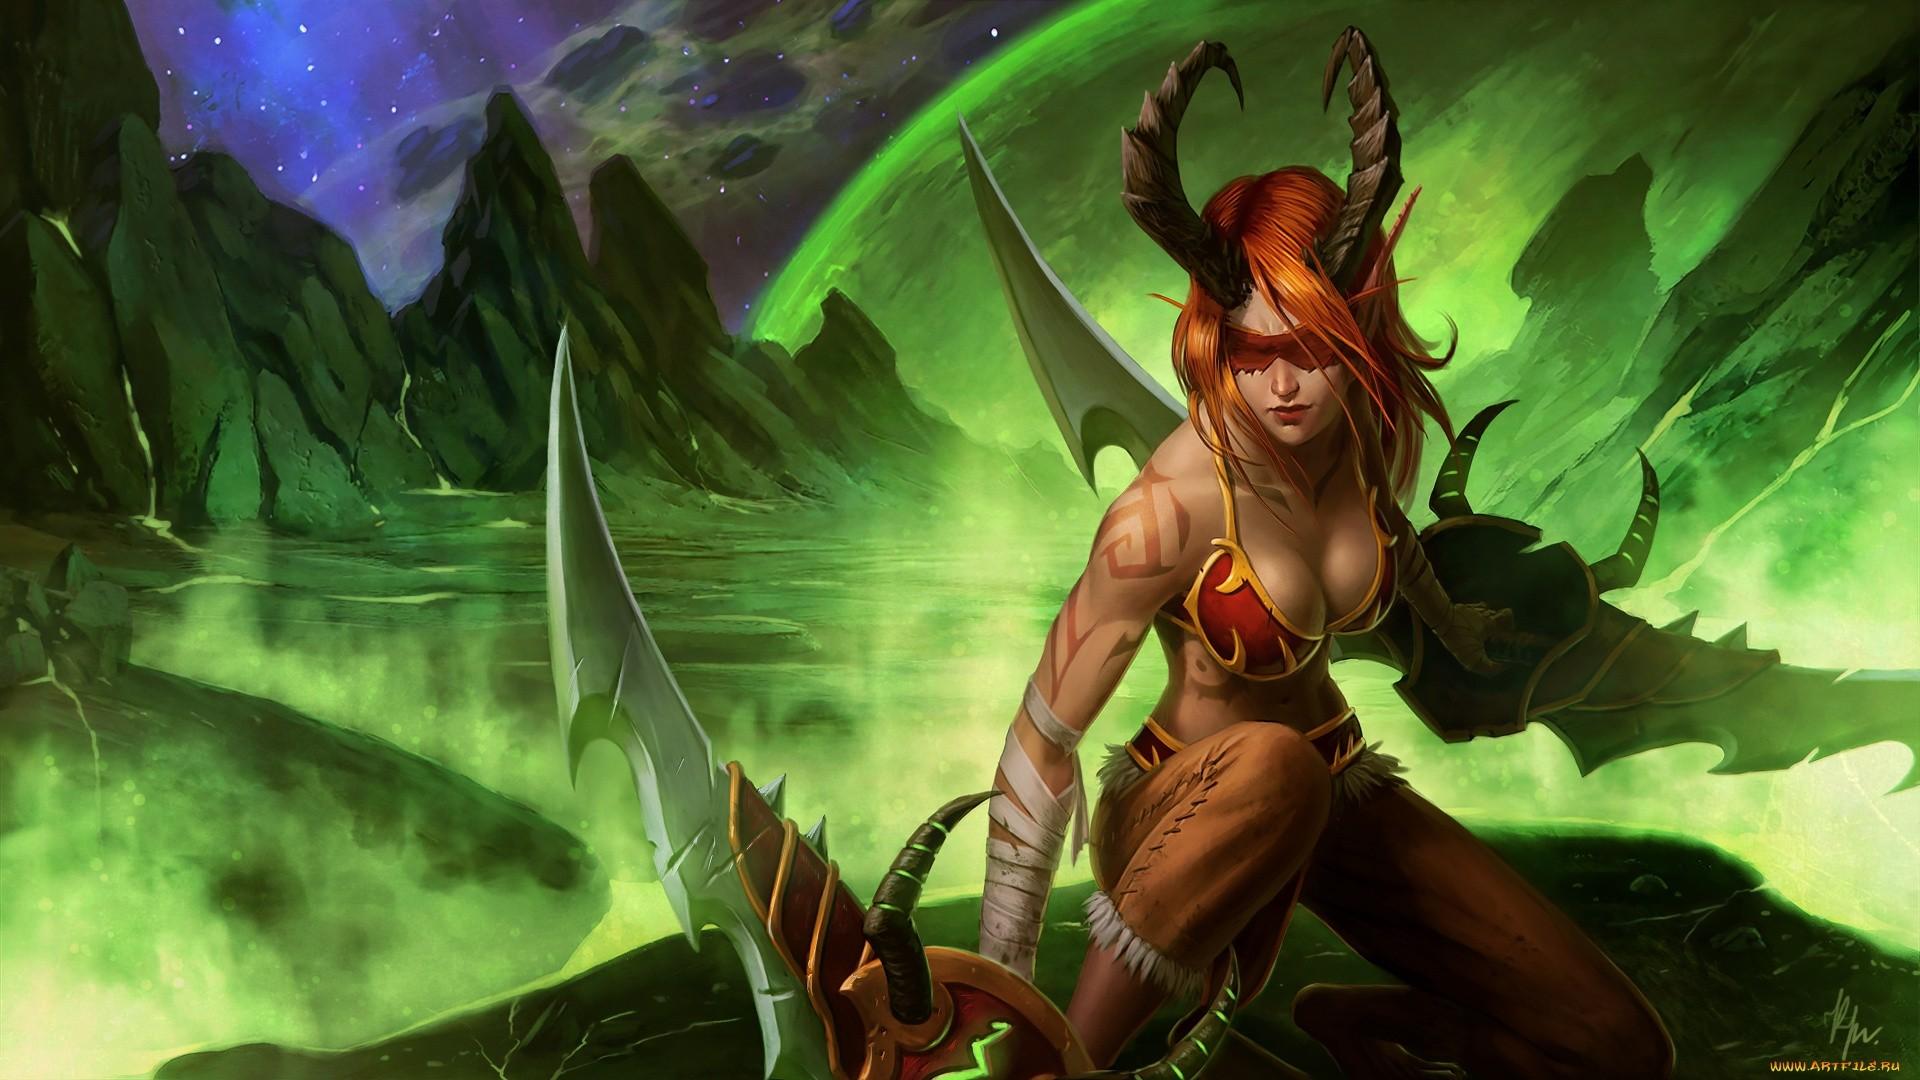 Demon Hunter HD Wallpaper Download